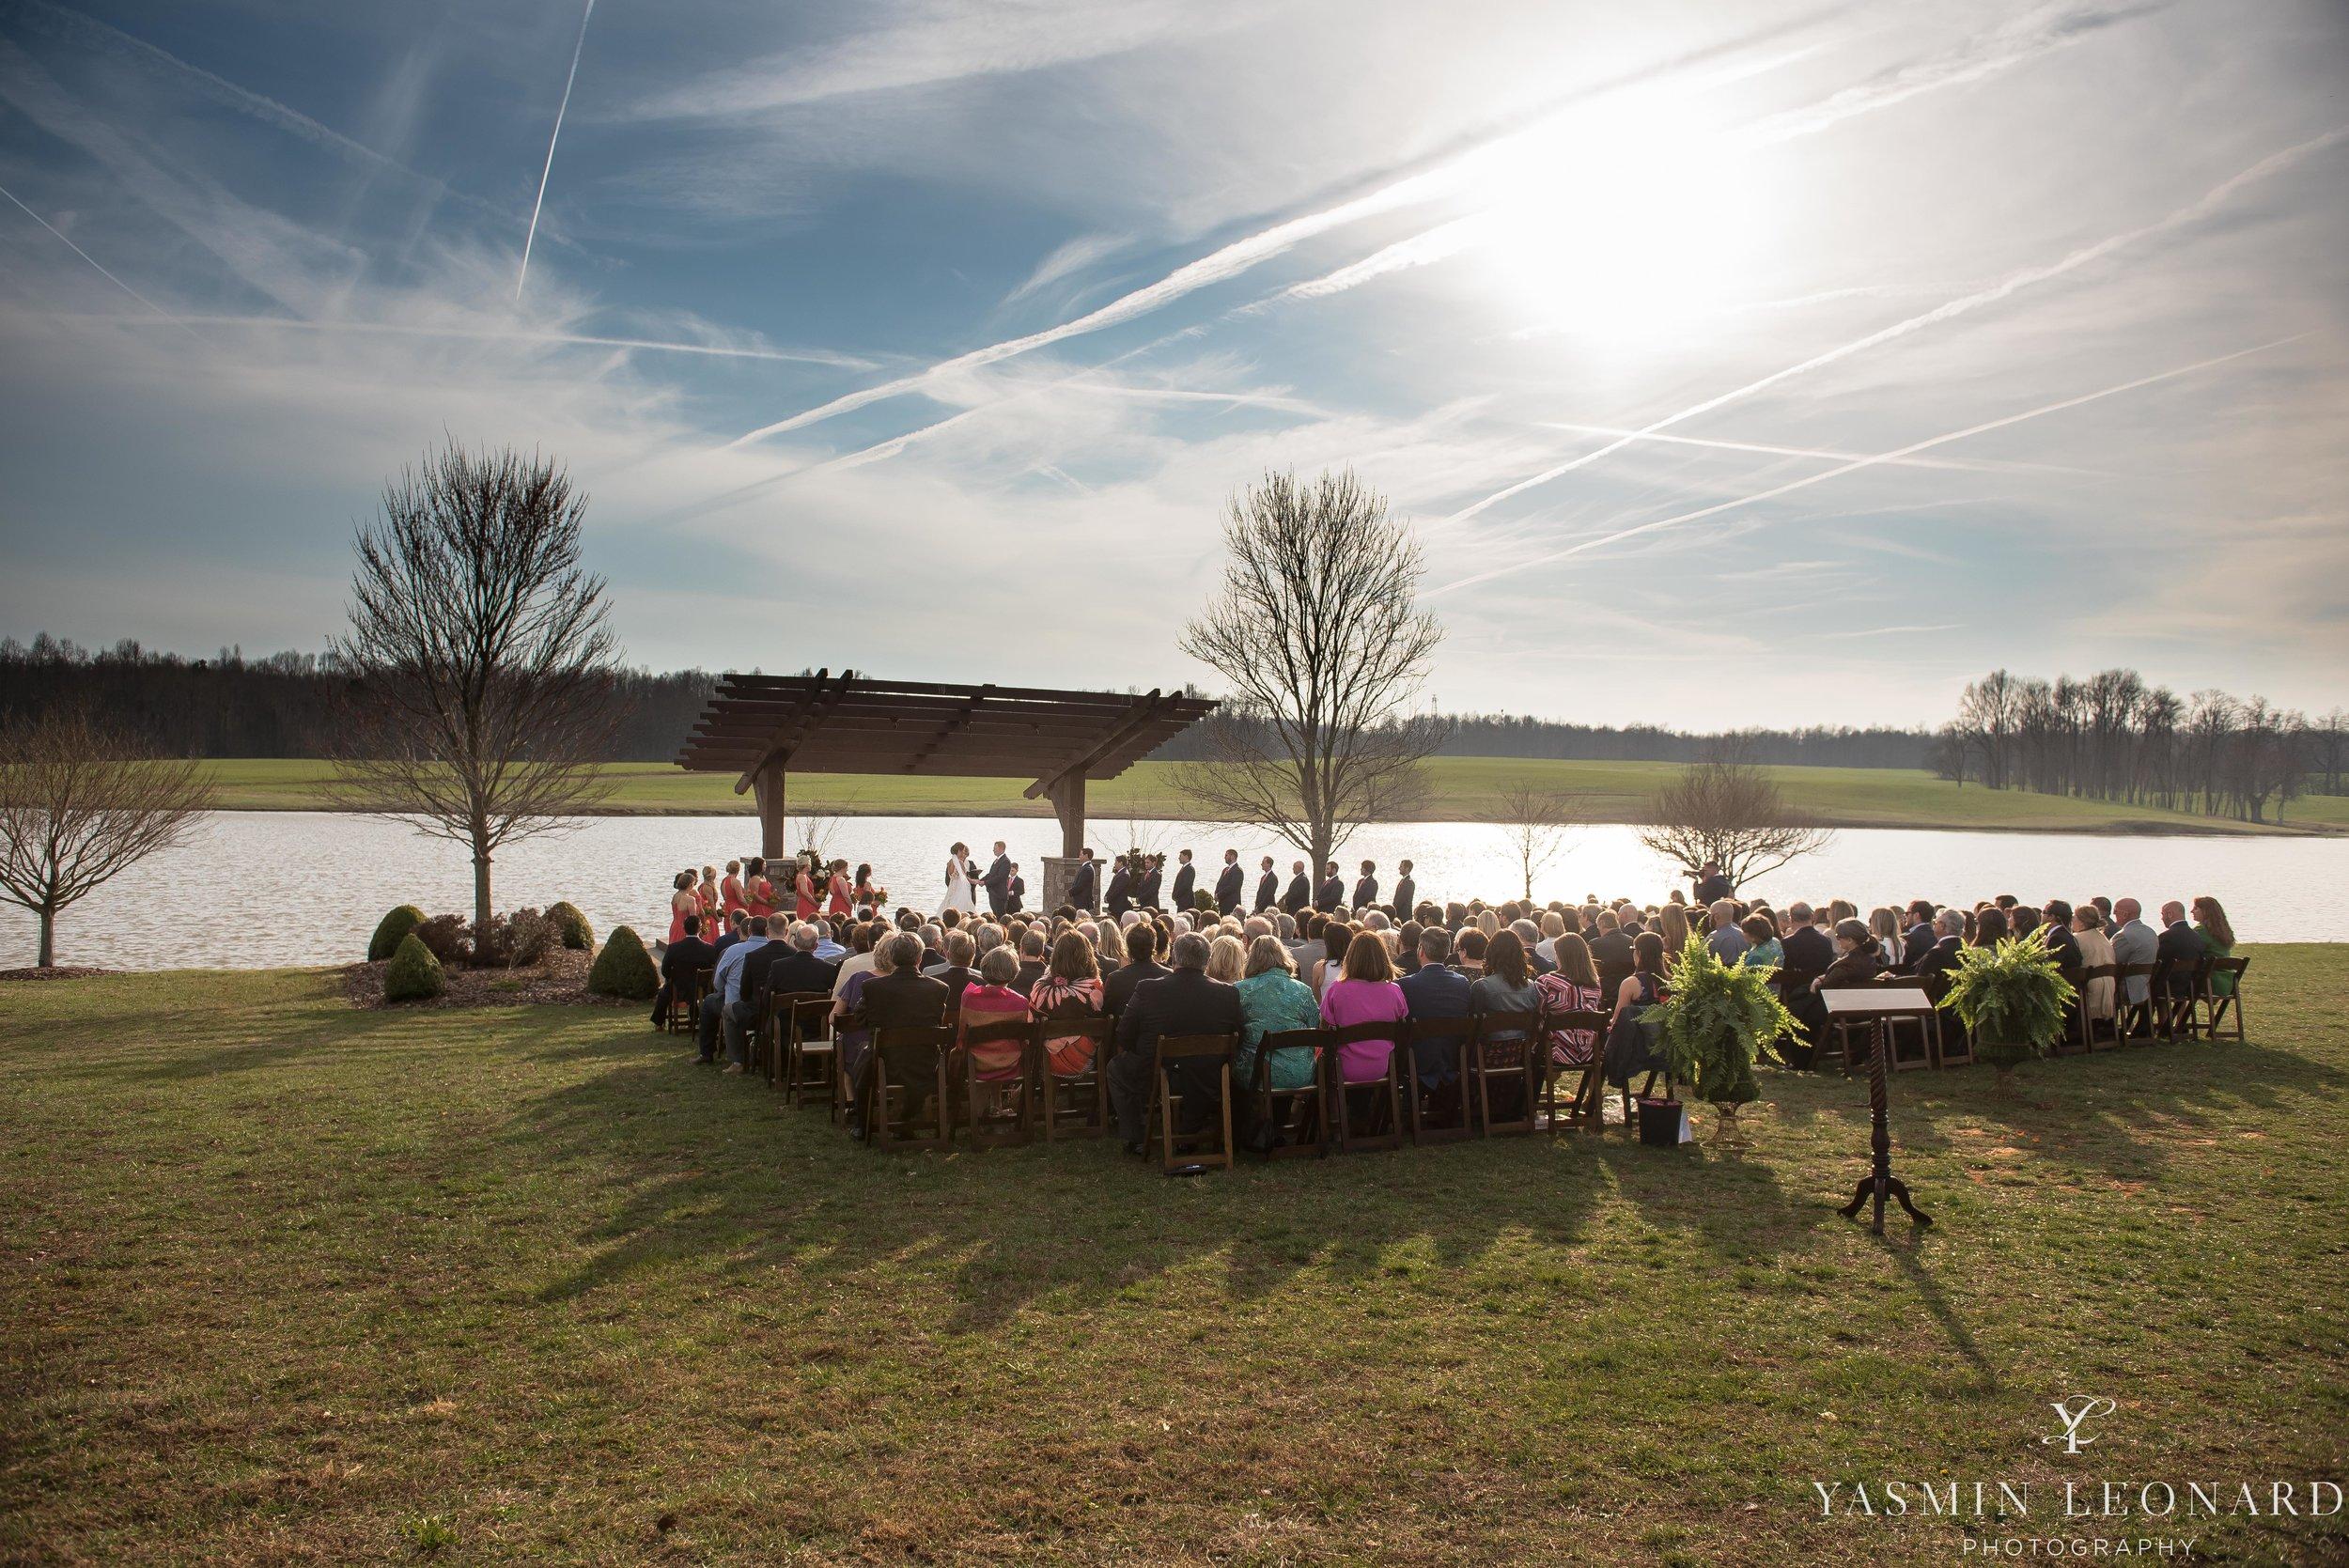 Adaumont Farm - Adaumont Farm Weddings - Trinity Weddings - NC Weddings - Yasmin Leonard Photography-34.jpg